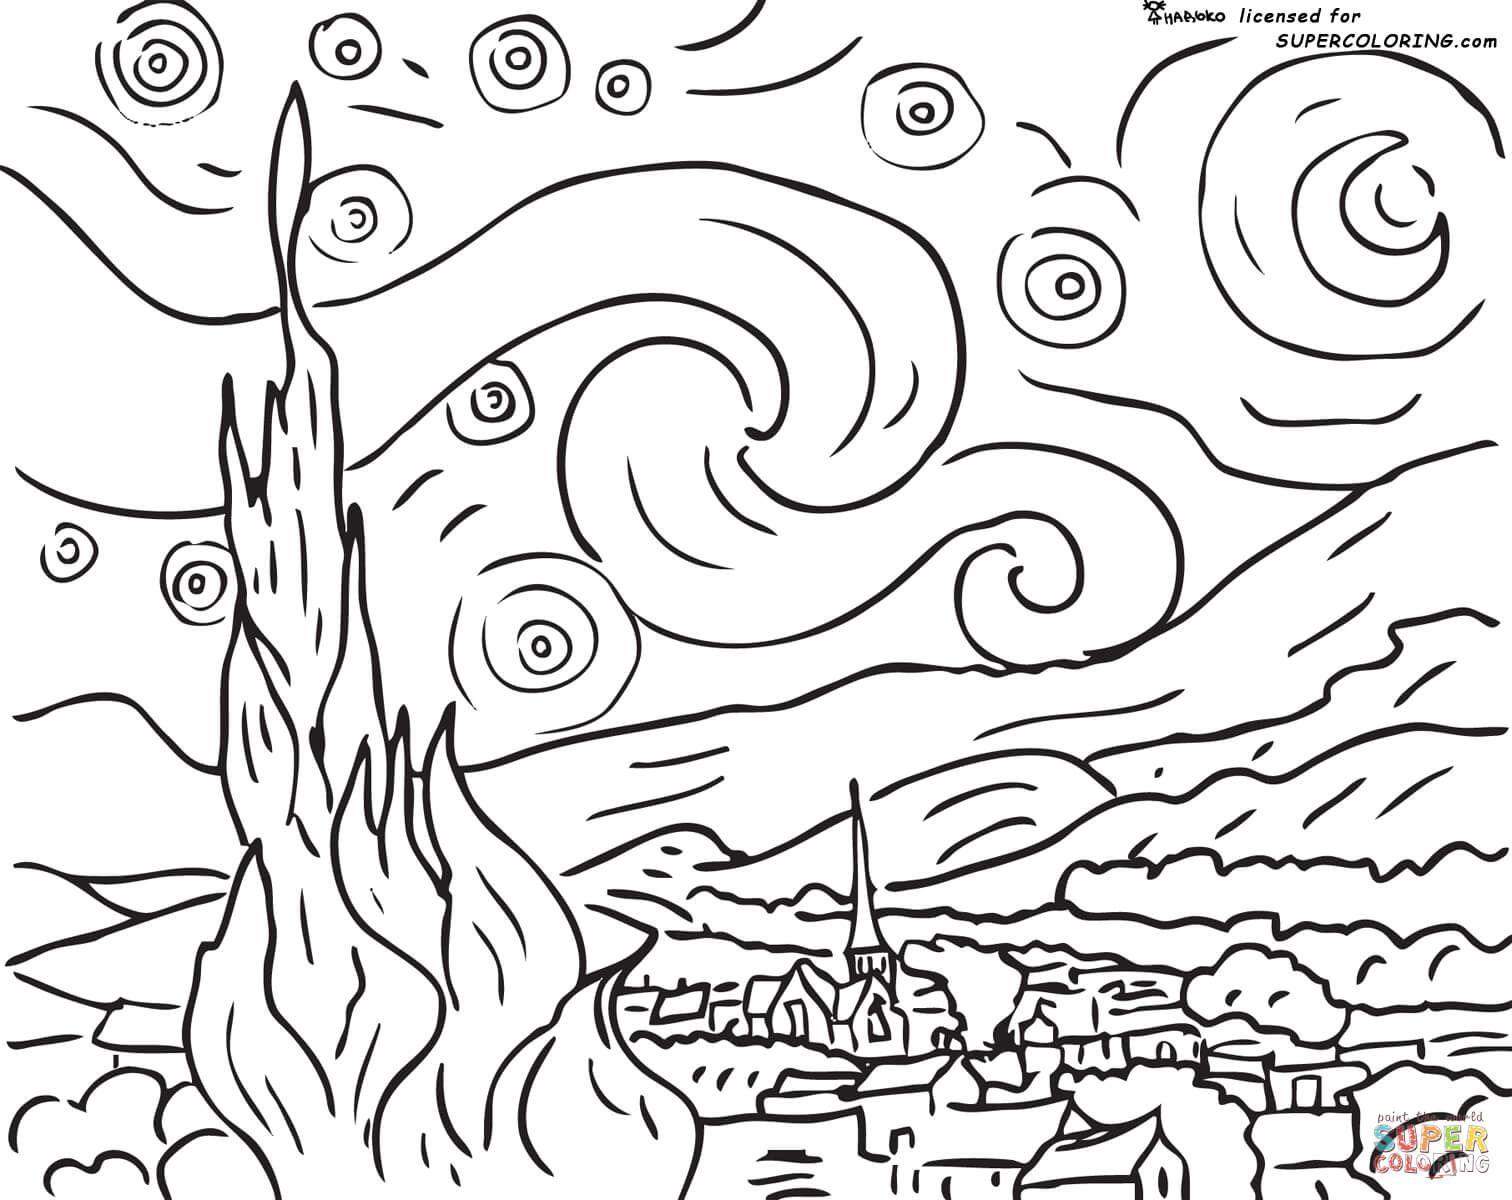 Coloring book outlines - Noite Estrelada Por Vincent Van Gogh Super Coloring